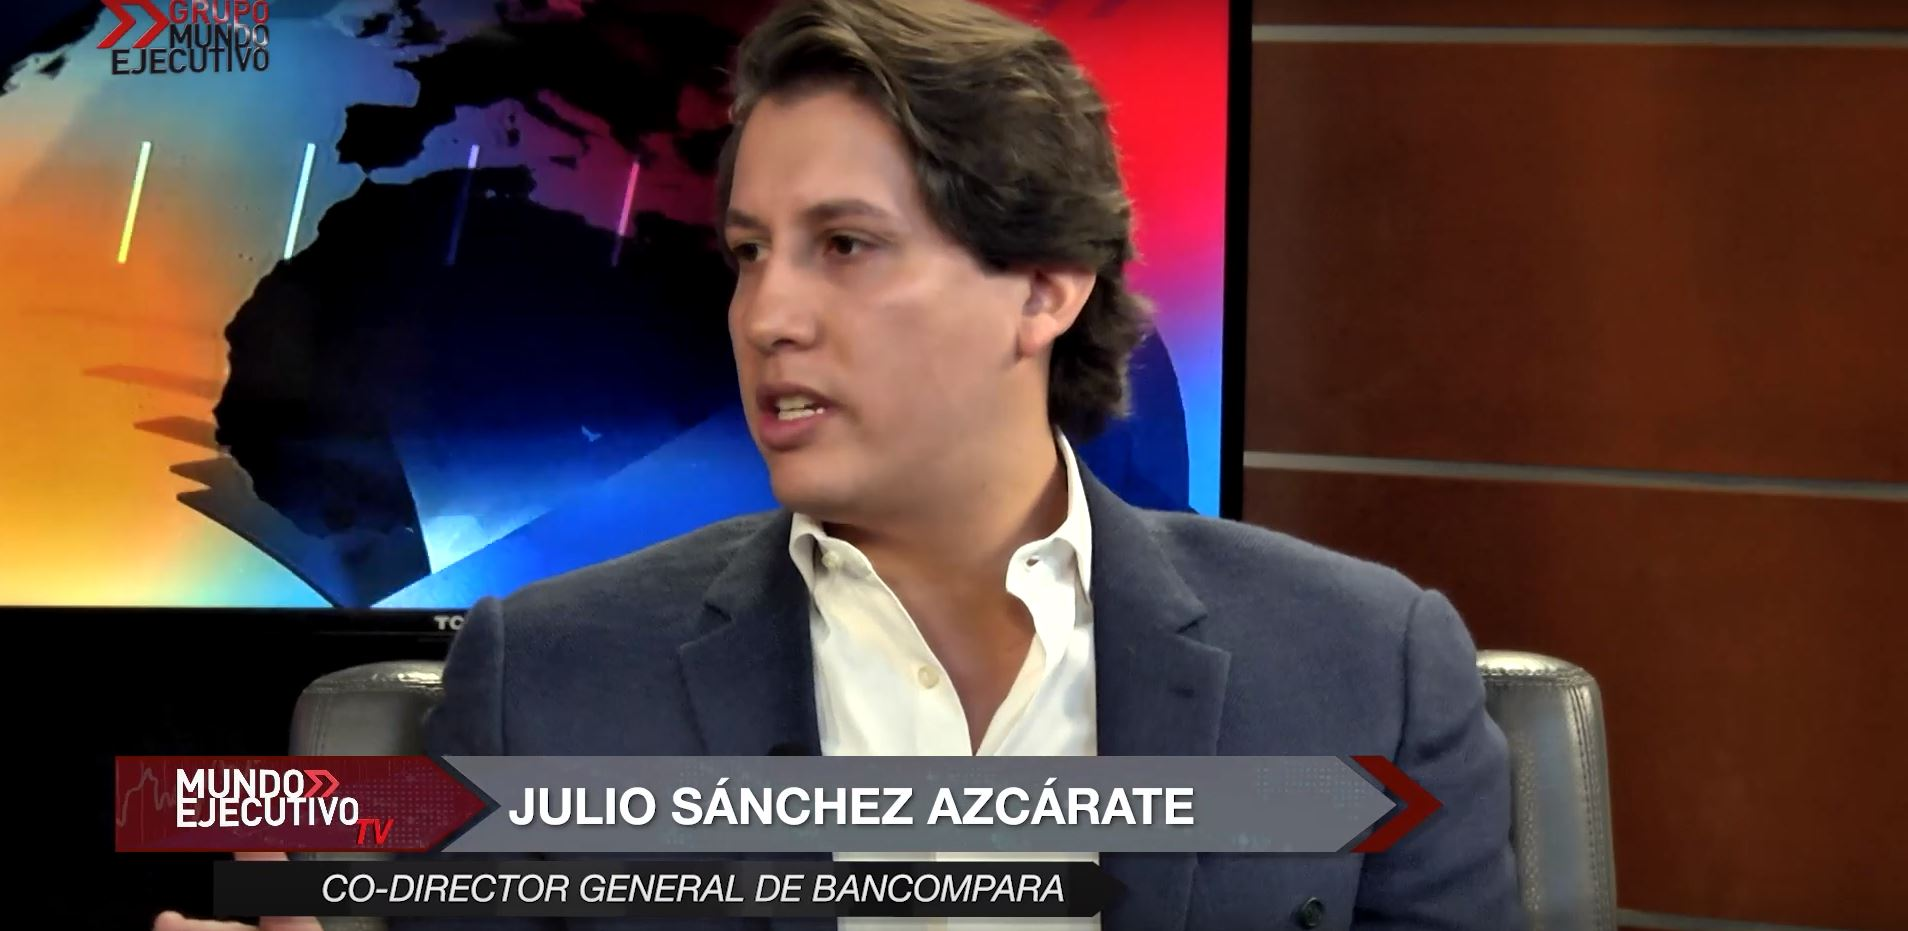 Mundo ejecutivo - Julio Sanchez Alcárate